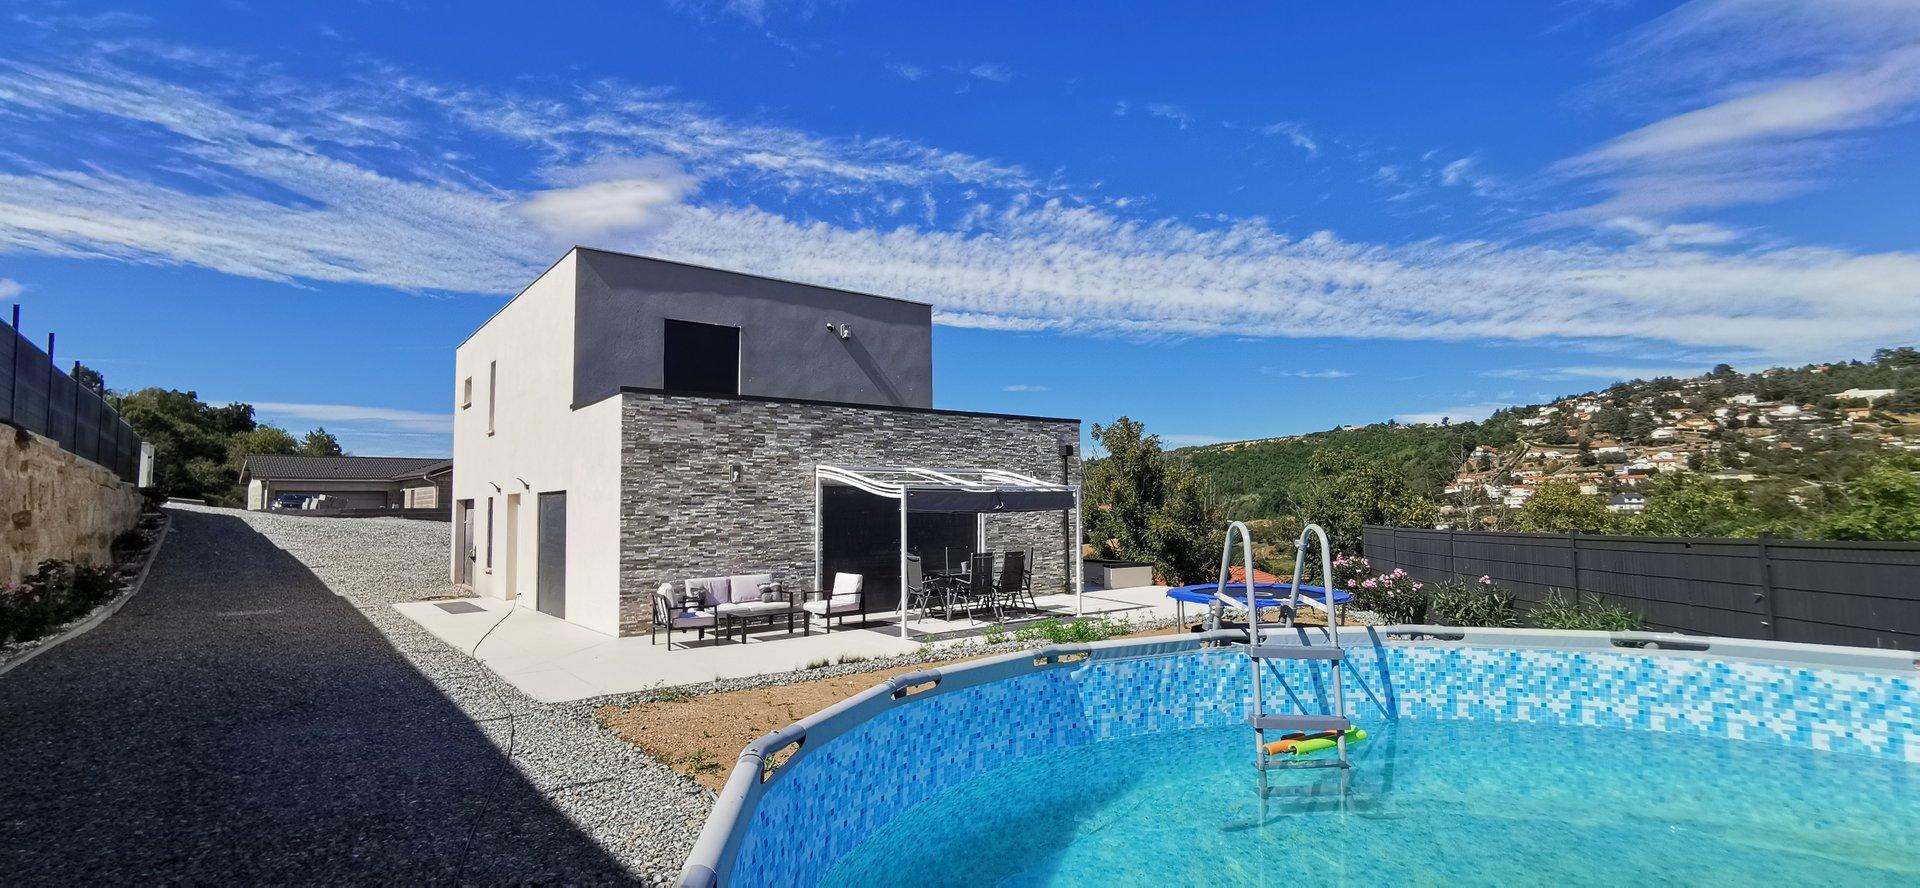 Vente Villa - Saint-Genest-Lerpt